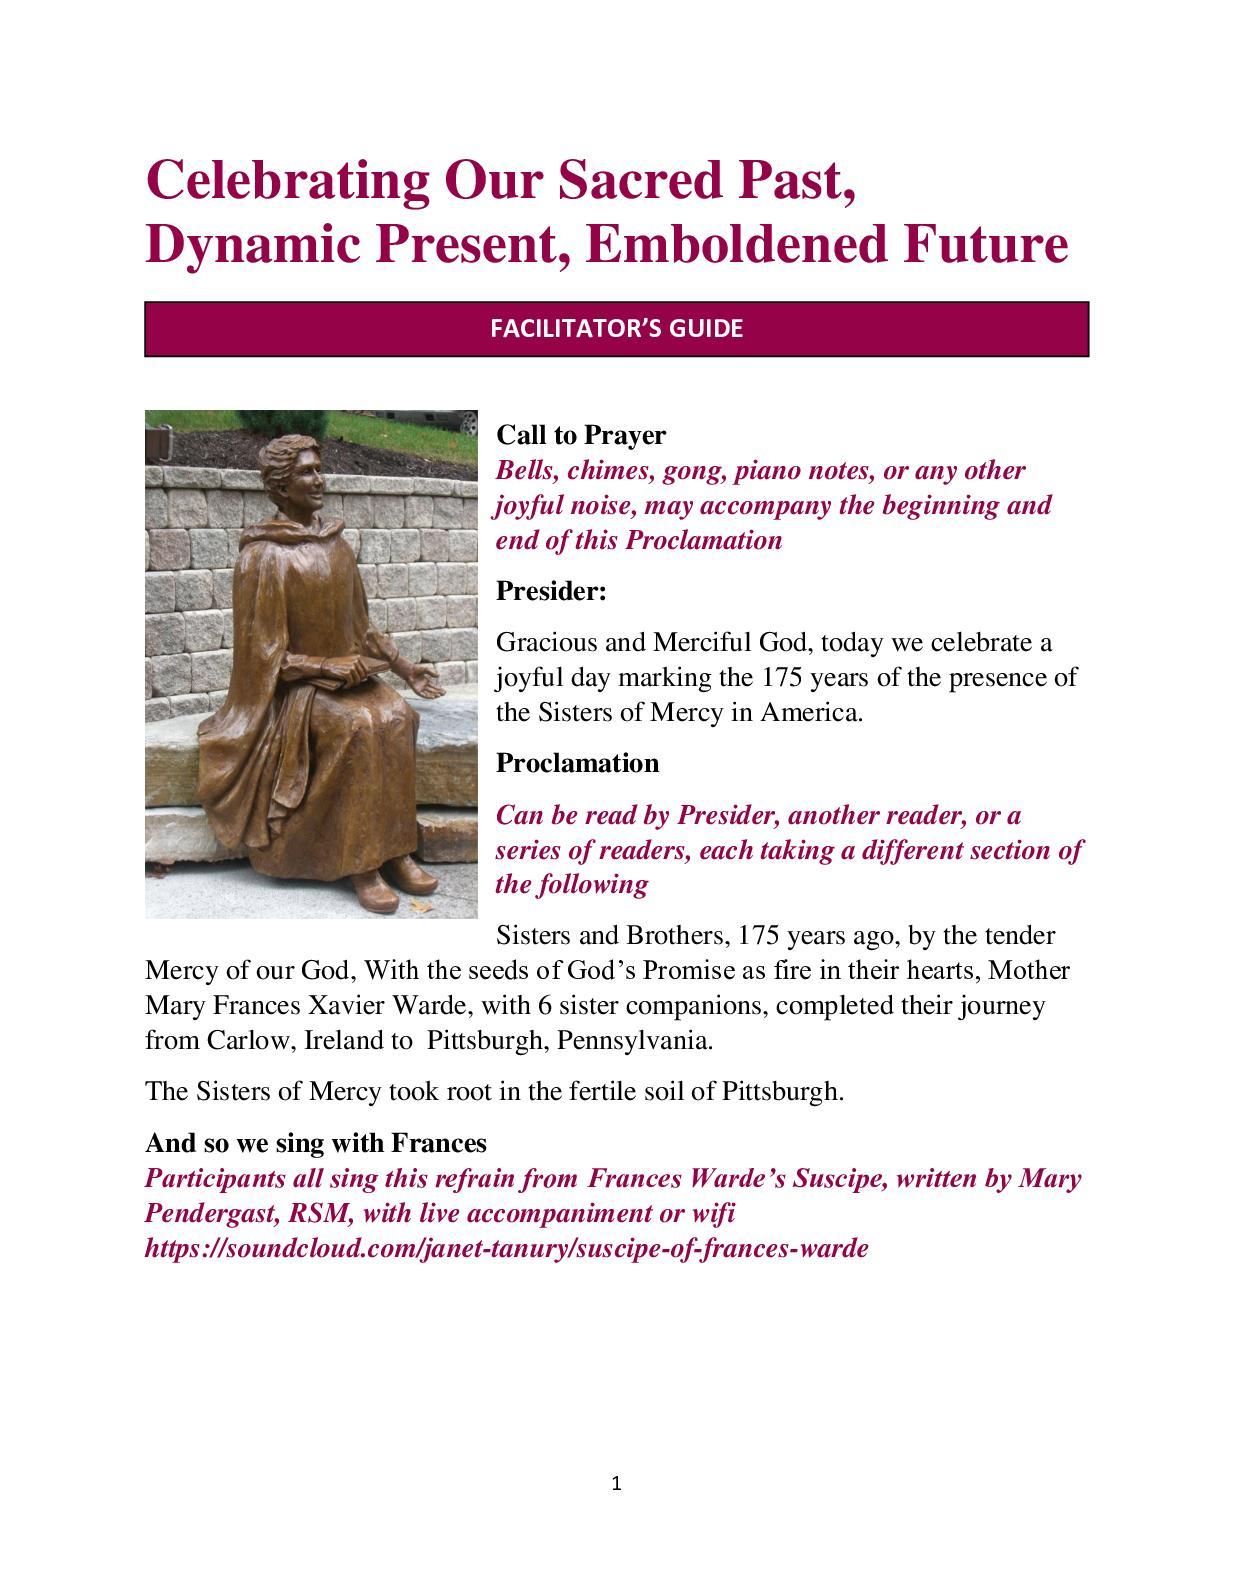 Calaméo - Facilitator Guide 175th Foundation Day Prayer